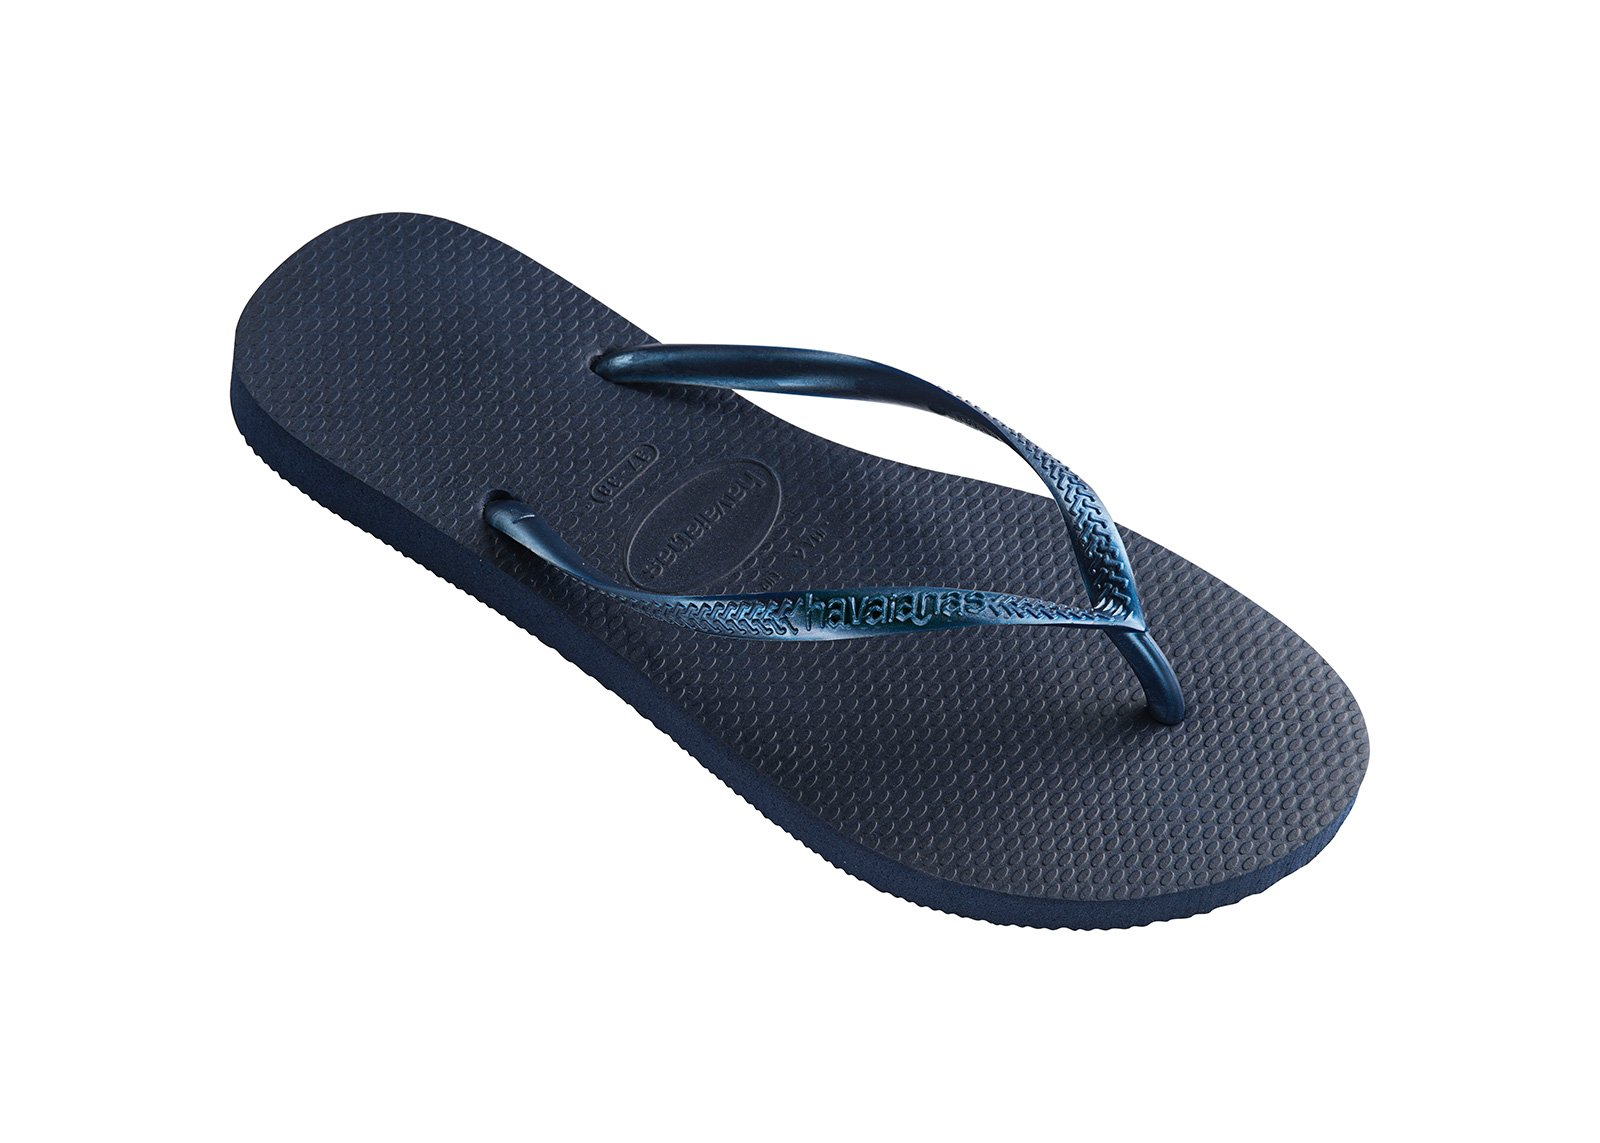 Flip Flops Flip Flops Havaianas Slim Navy Blue Brand